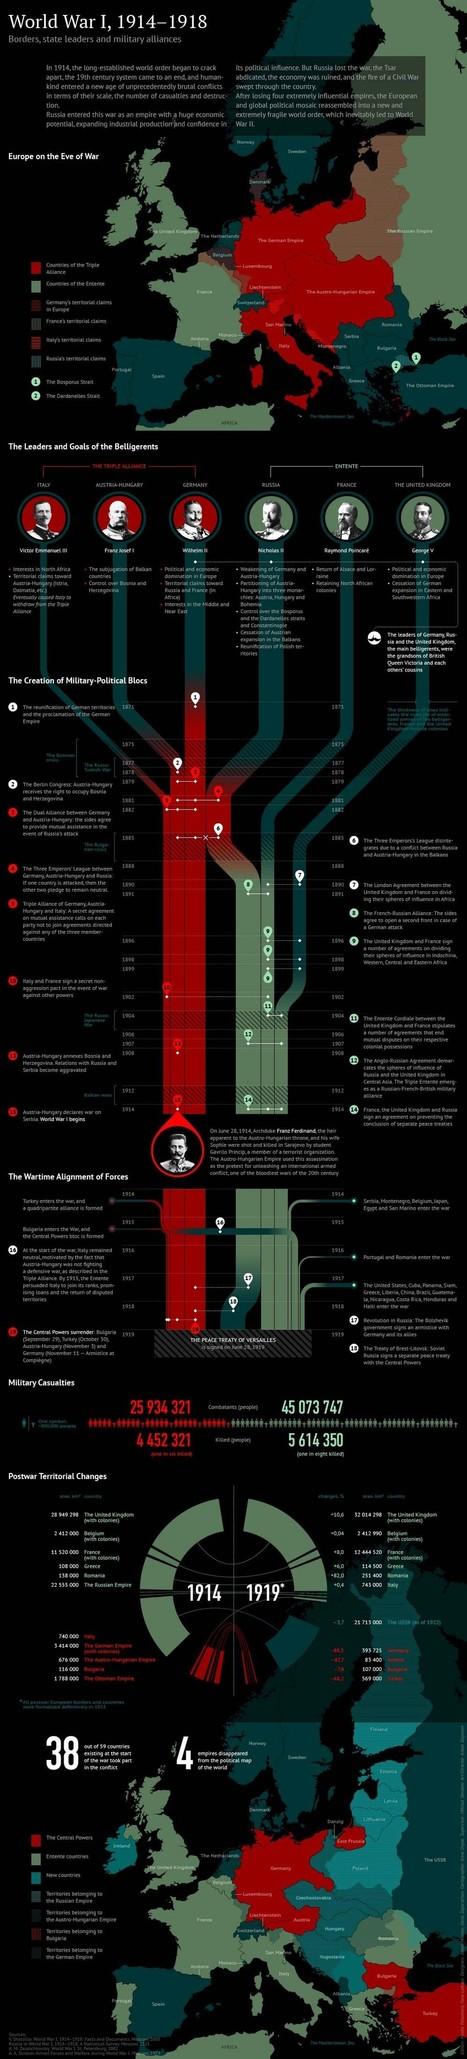 Infographic World War I 1914-1918 | Infographics Creator | Navigate | Scoop.it